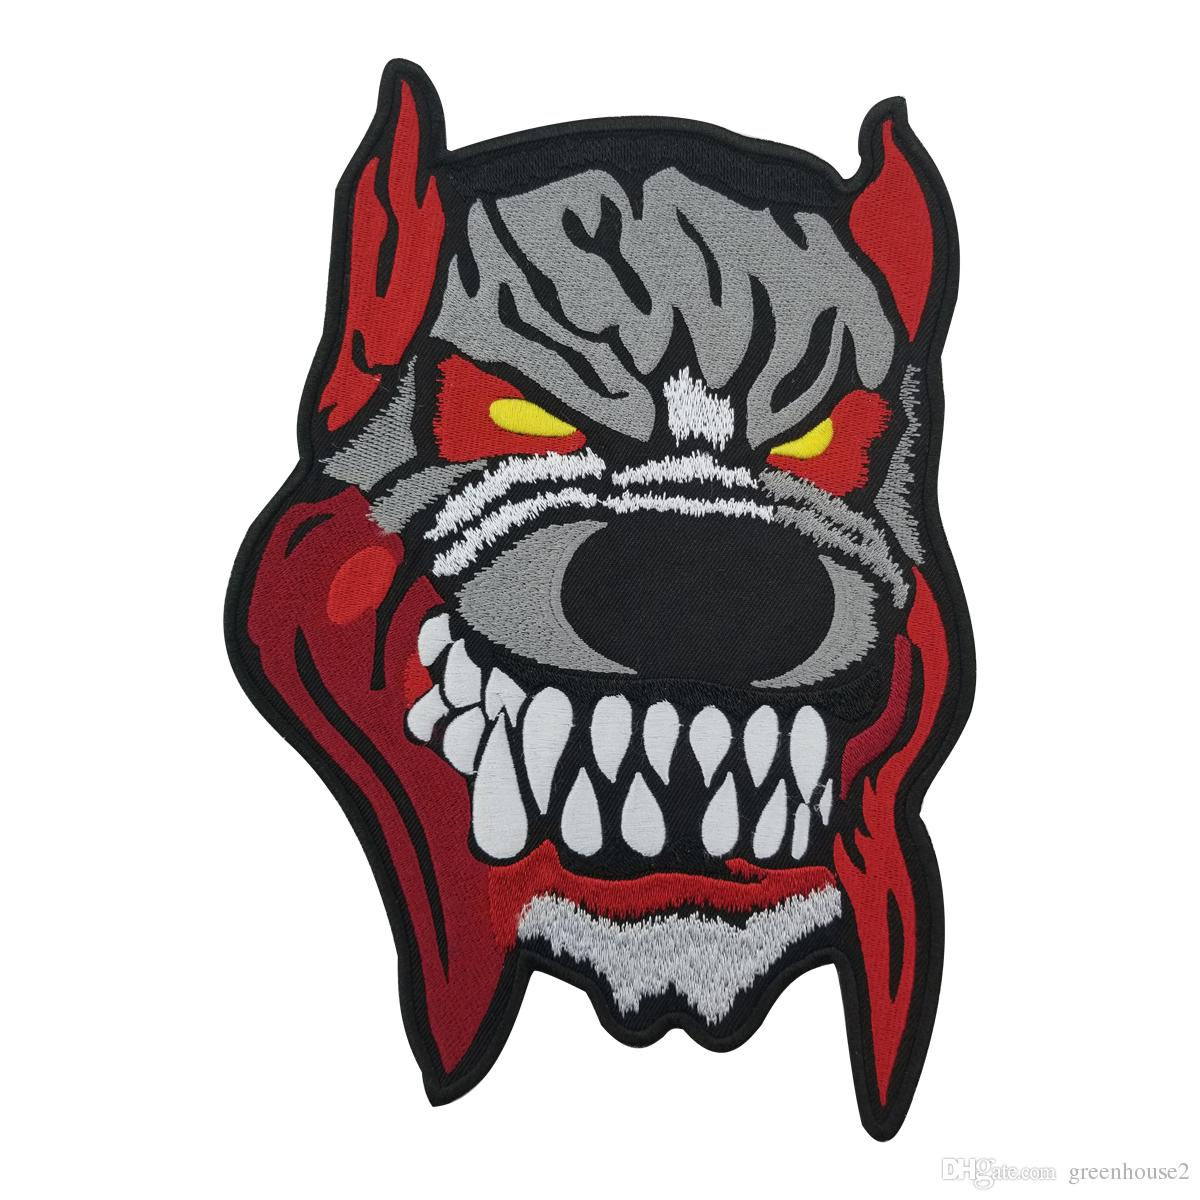 1200x1200 evil dog patch motorcycle club mc tradition biker vest patch